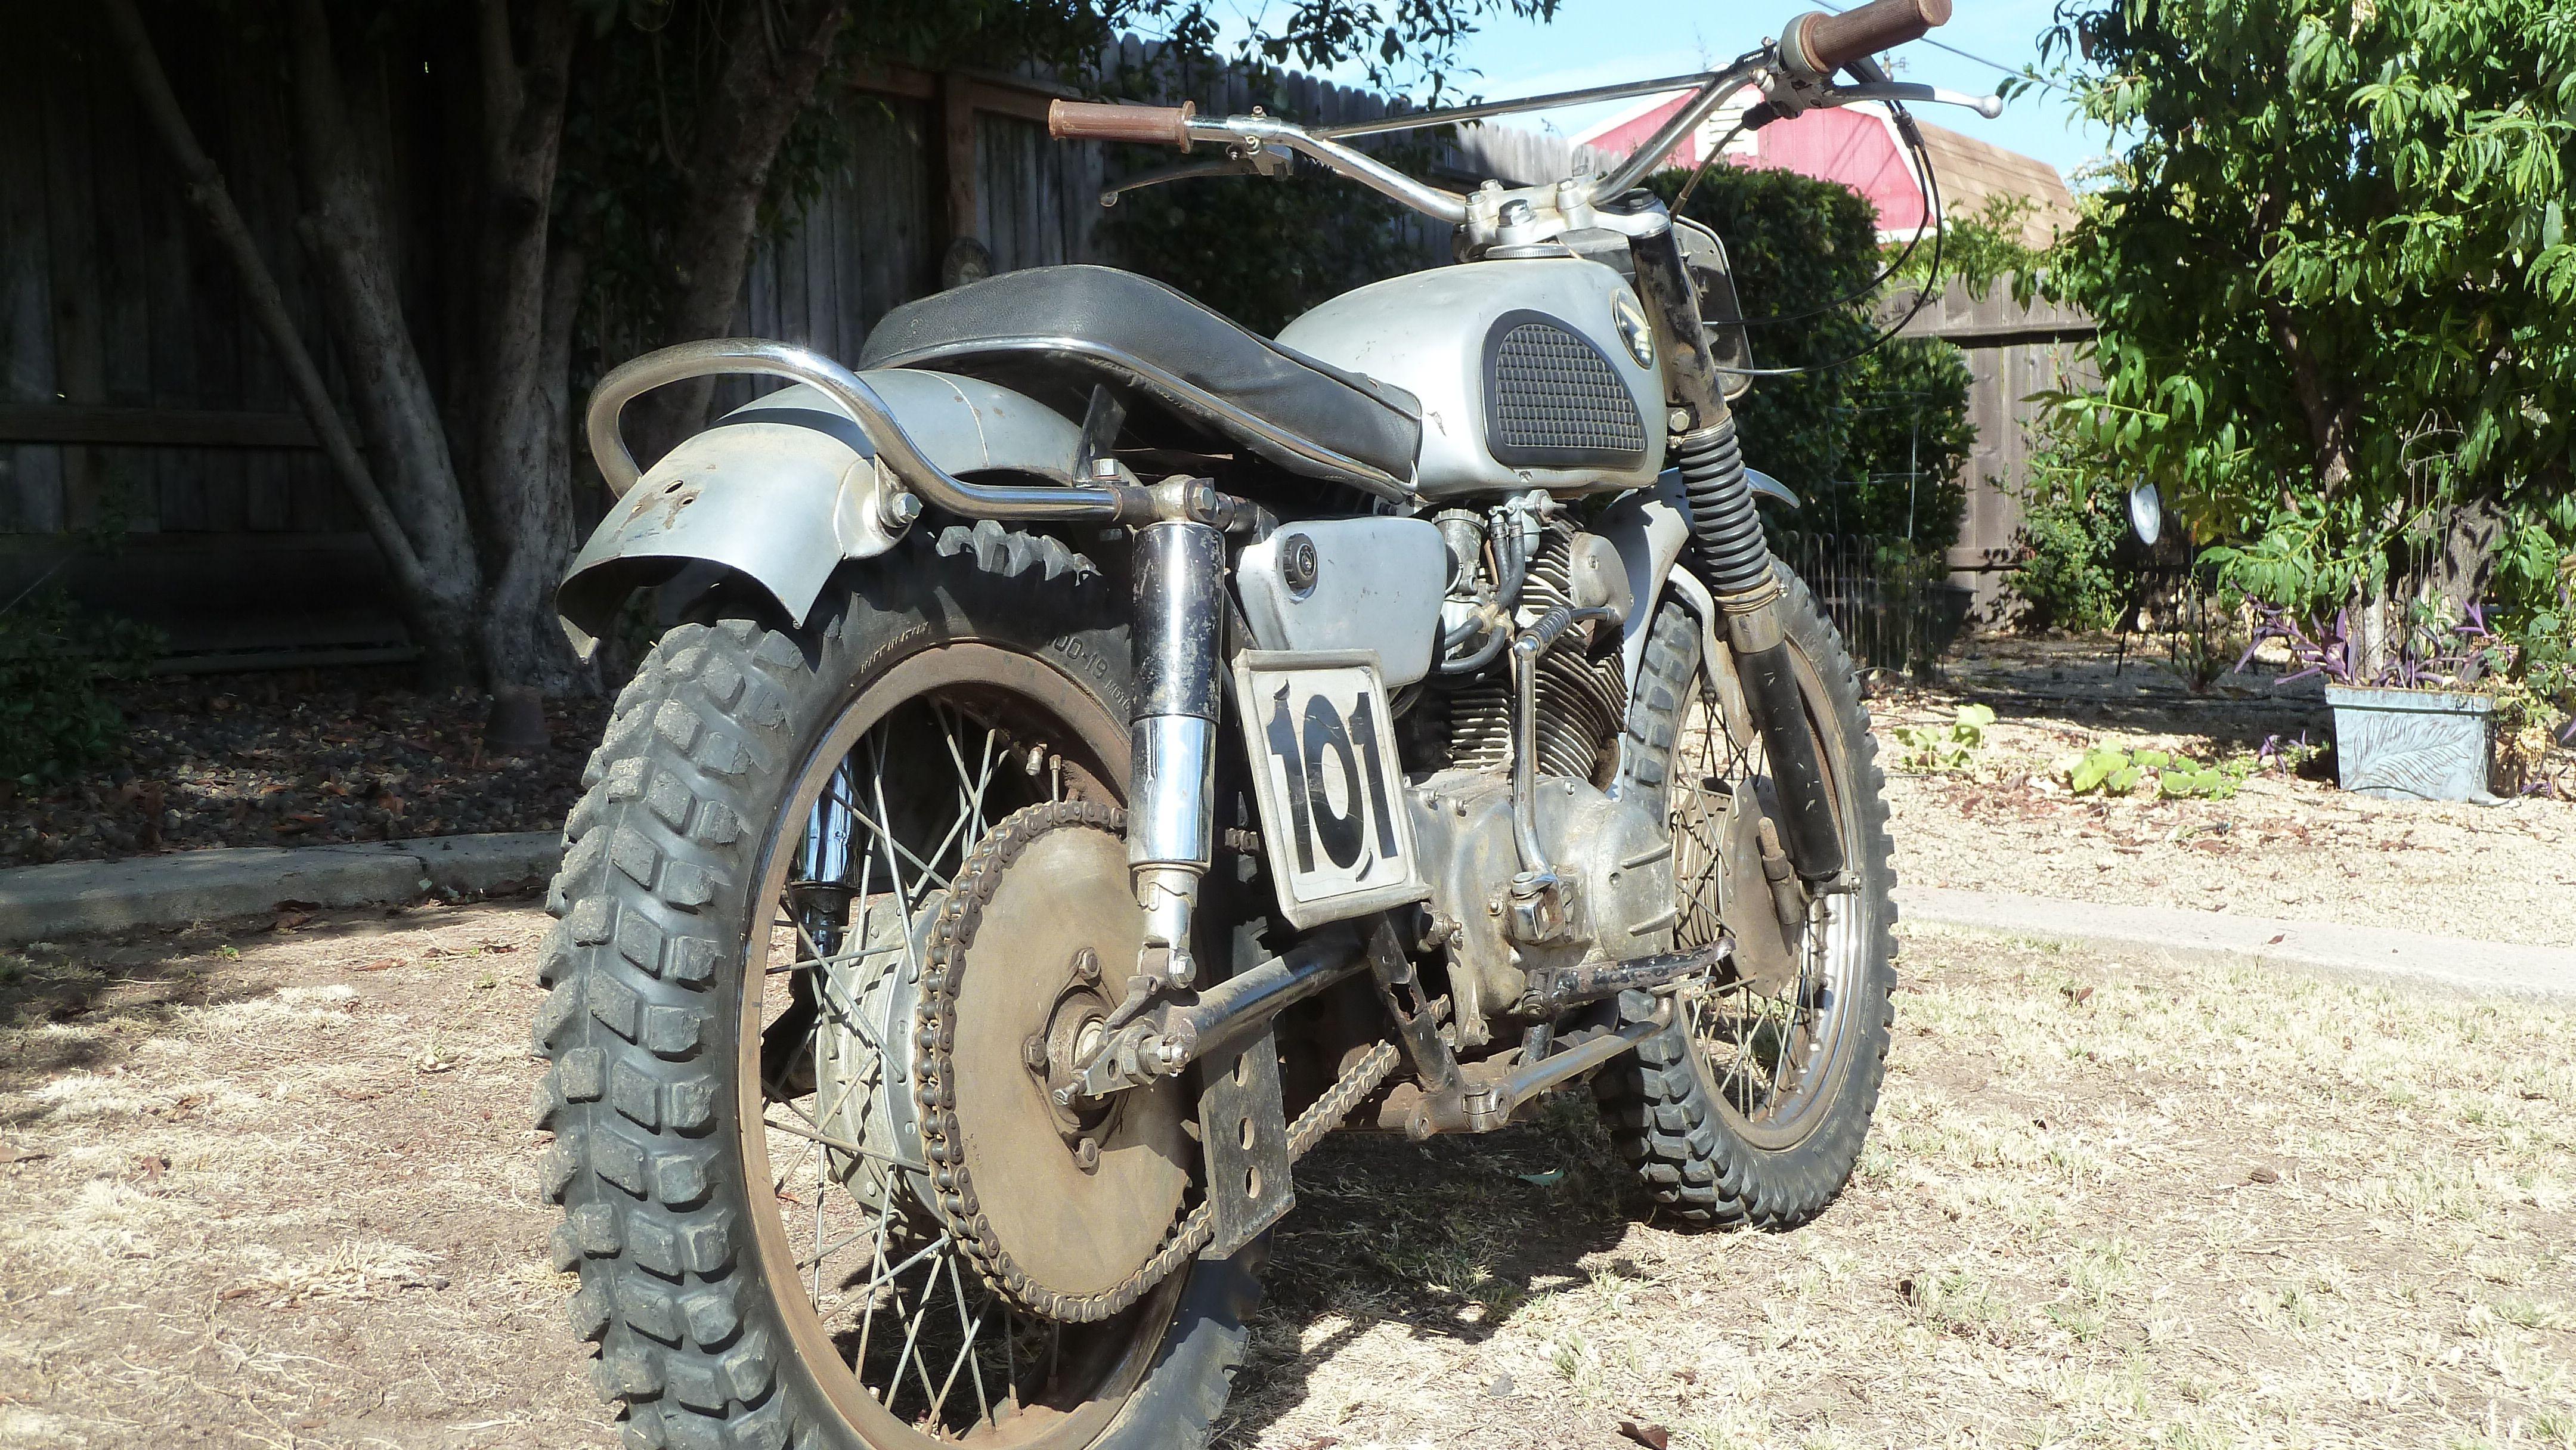 1965 Honda 305 Cl77 Race Scrambler Honda Vintage Motocross Scrambler [ 2432 x 4320 Pixel ]